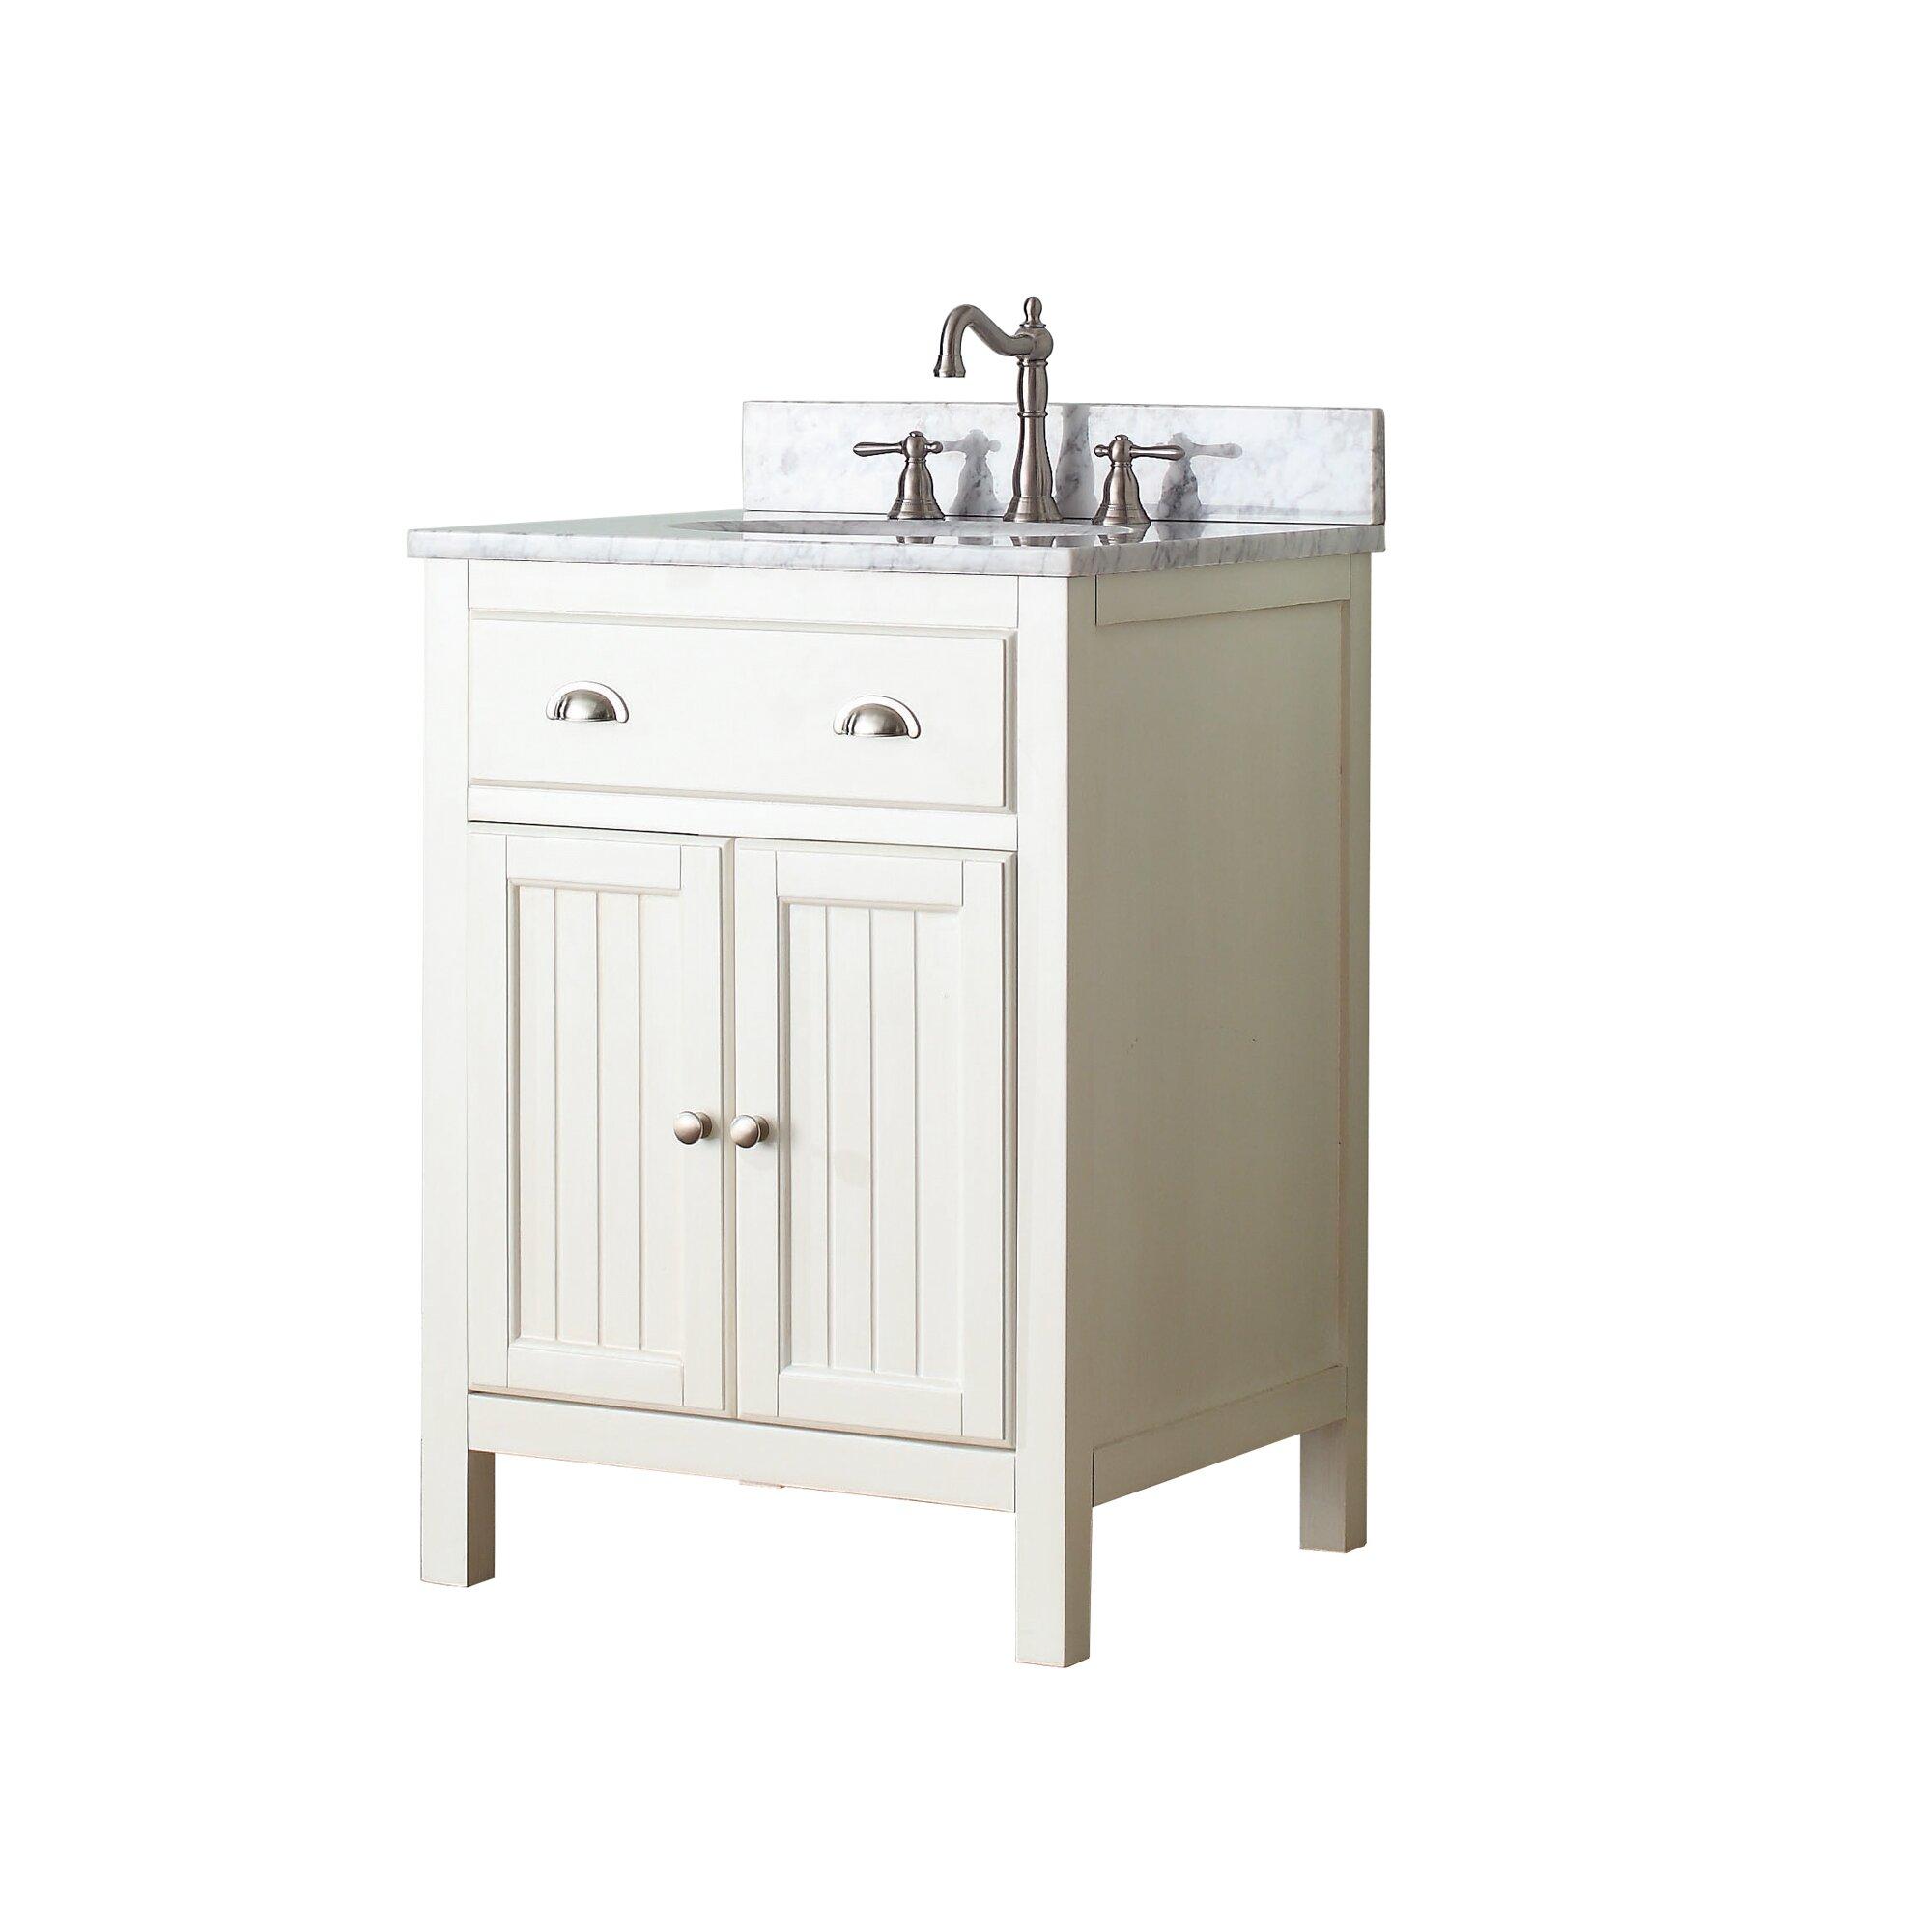 Avanity hamilton 25 single bathroom vanity set reviews wayfair for Bathroom vanities hamilton